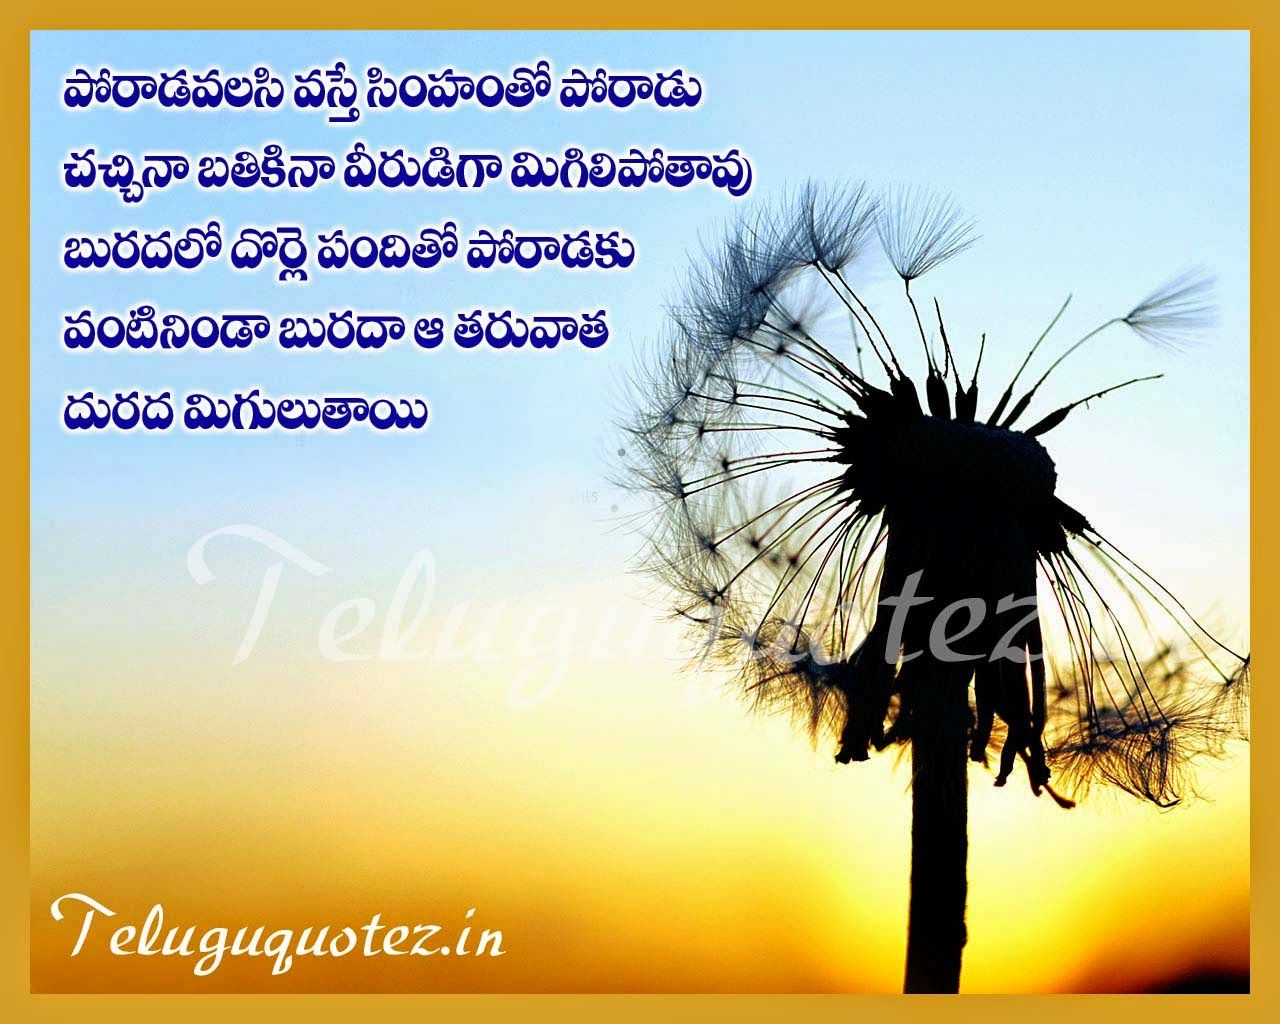 Quotes On Greatness Of Telugu Language